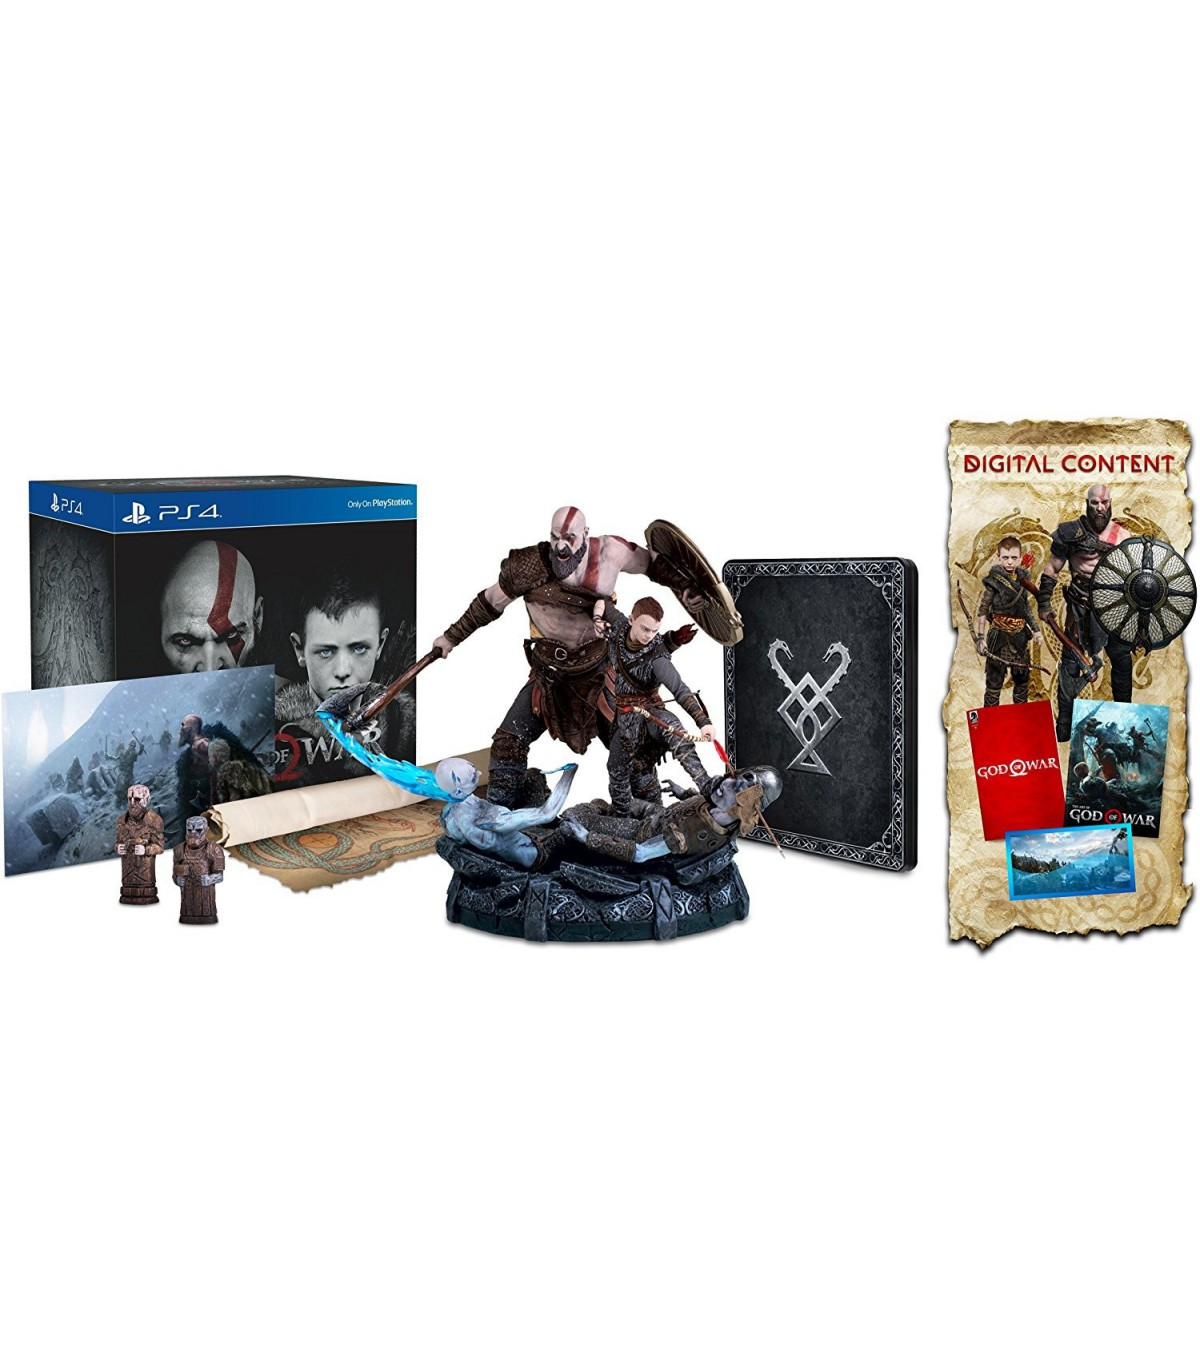 نسخه کالکتور بازی گاد او وار God of War Collector's Edition - پلی استیشن 4